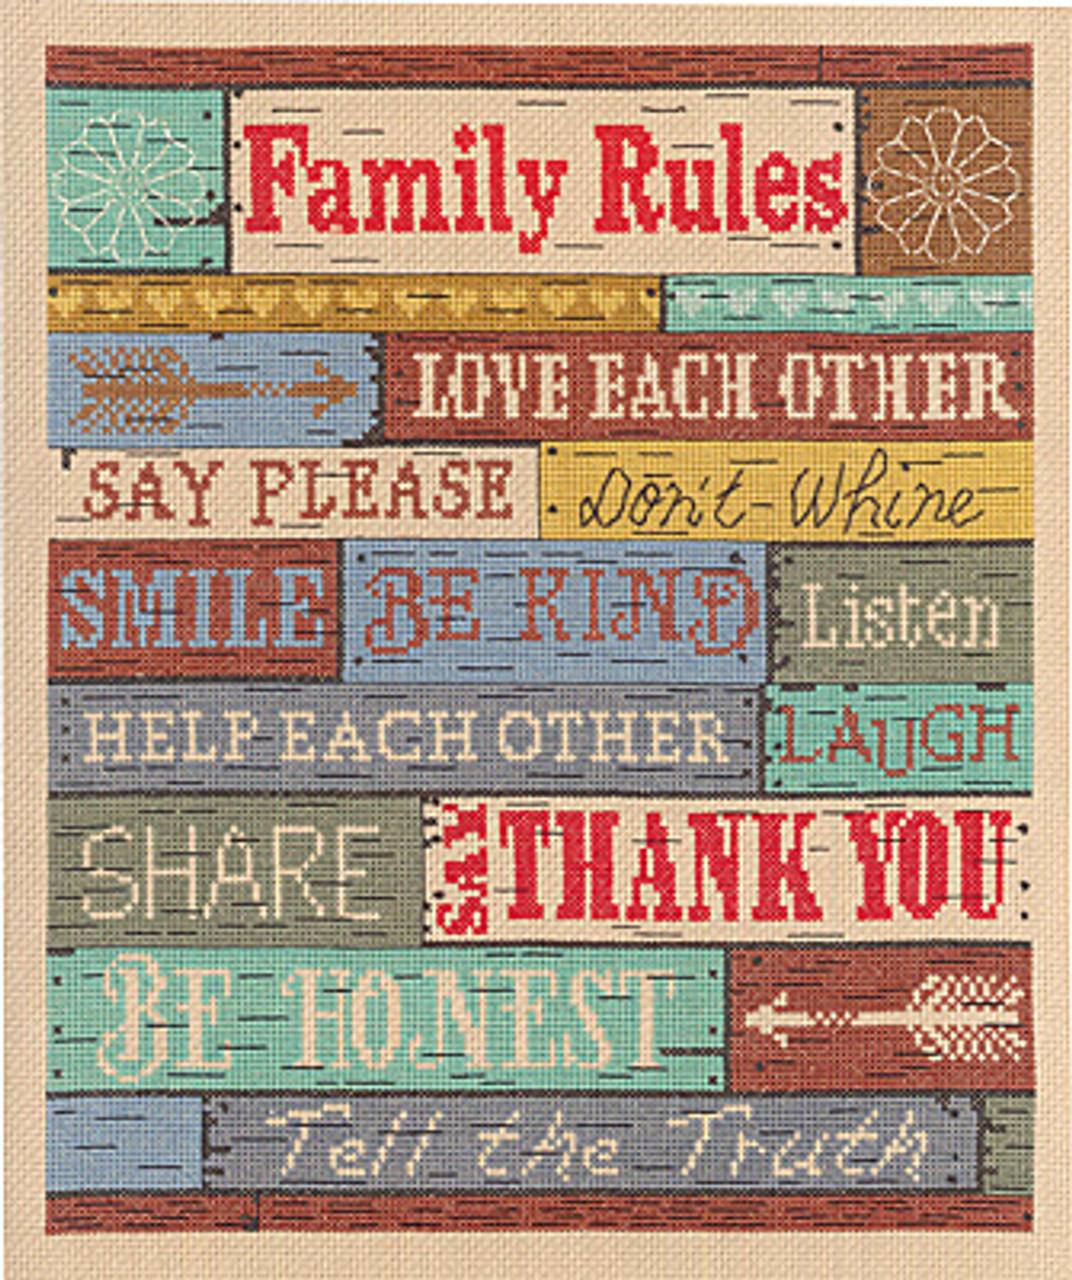 Janlynn - Family Rules